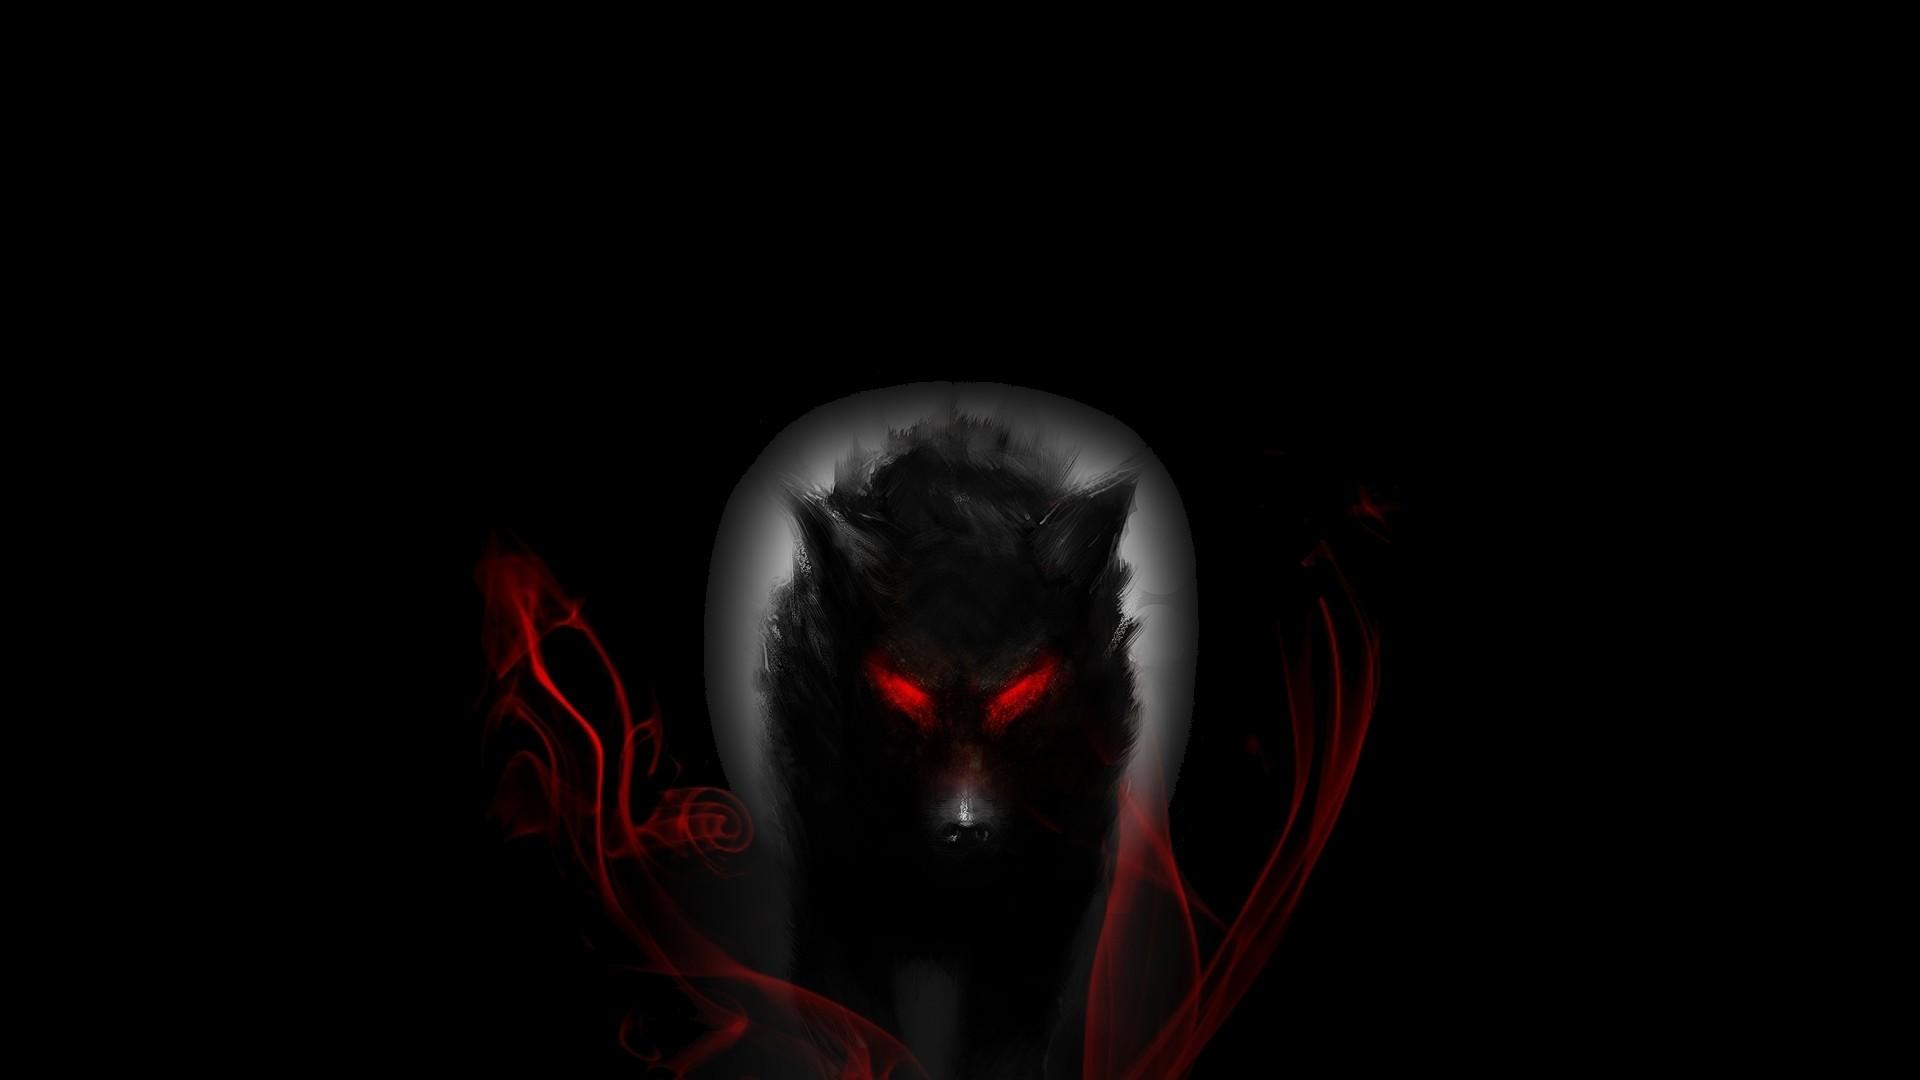 … Cool Wolf Wallpaper sZGCai …